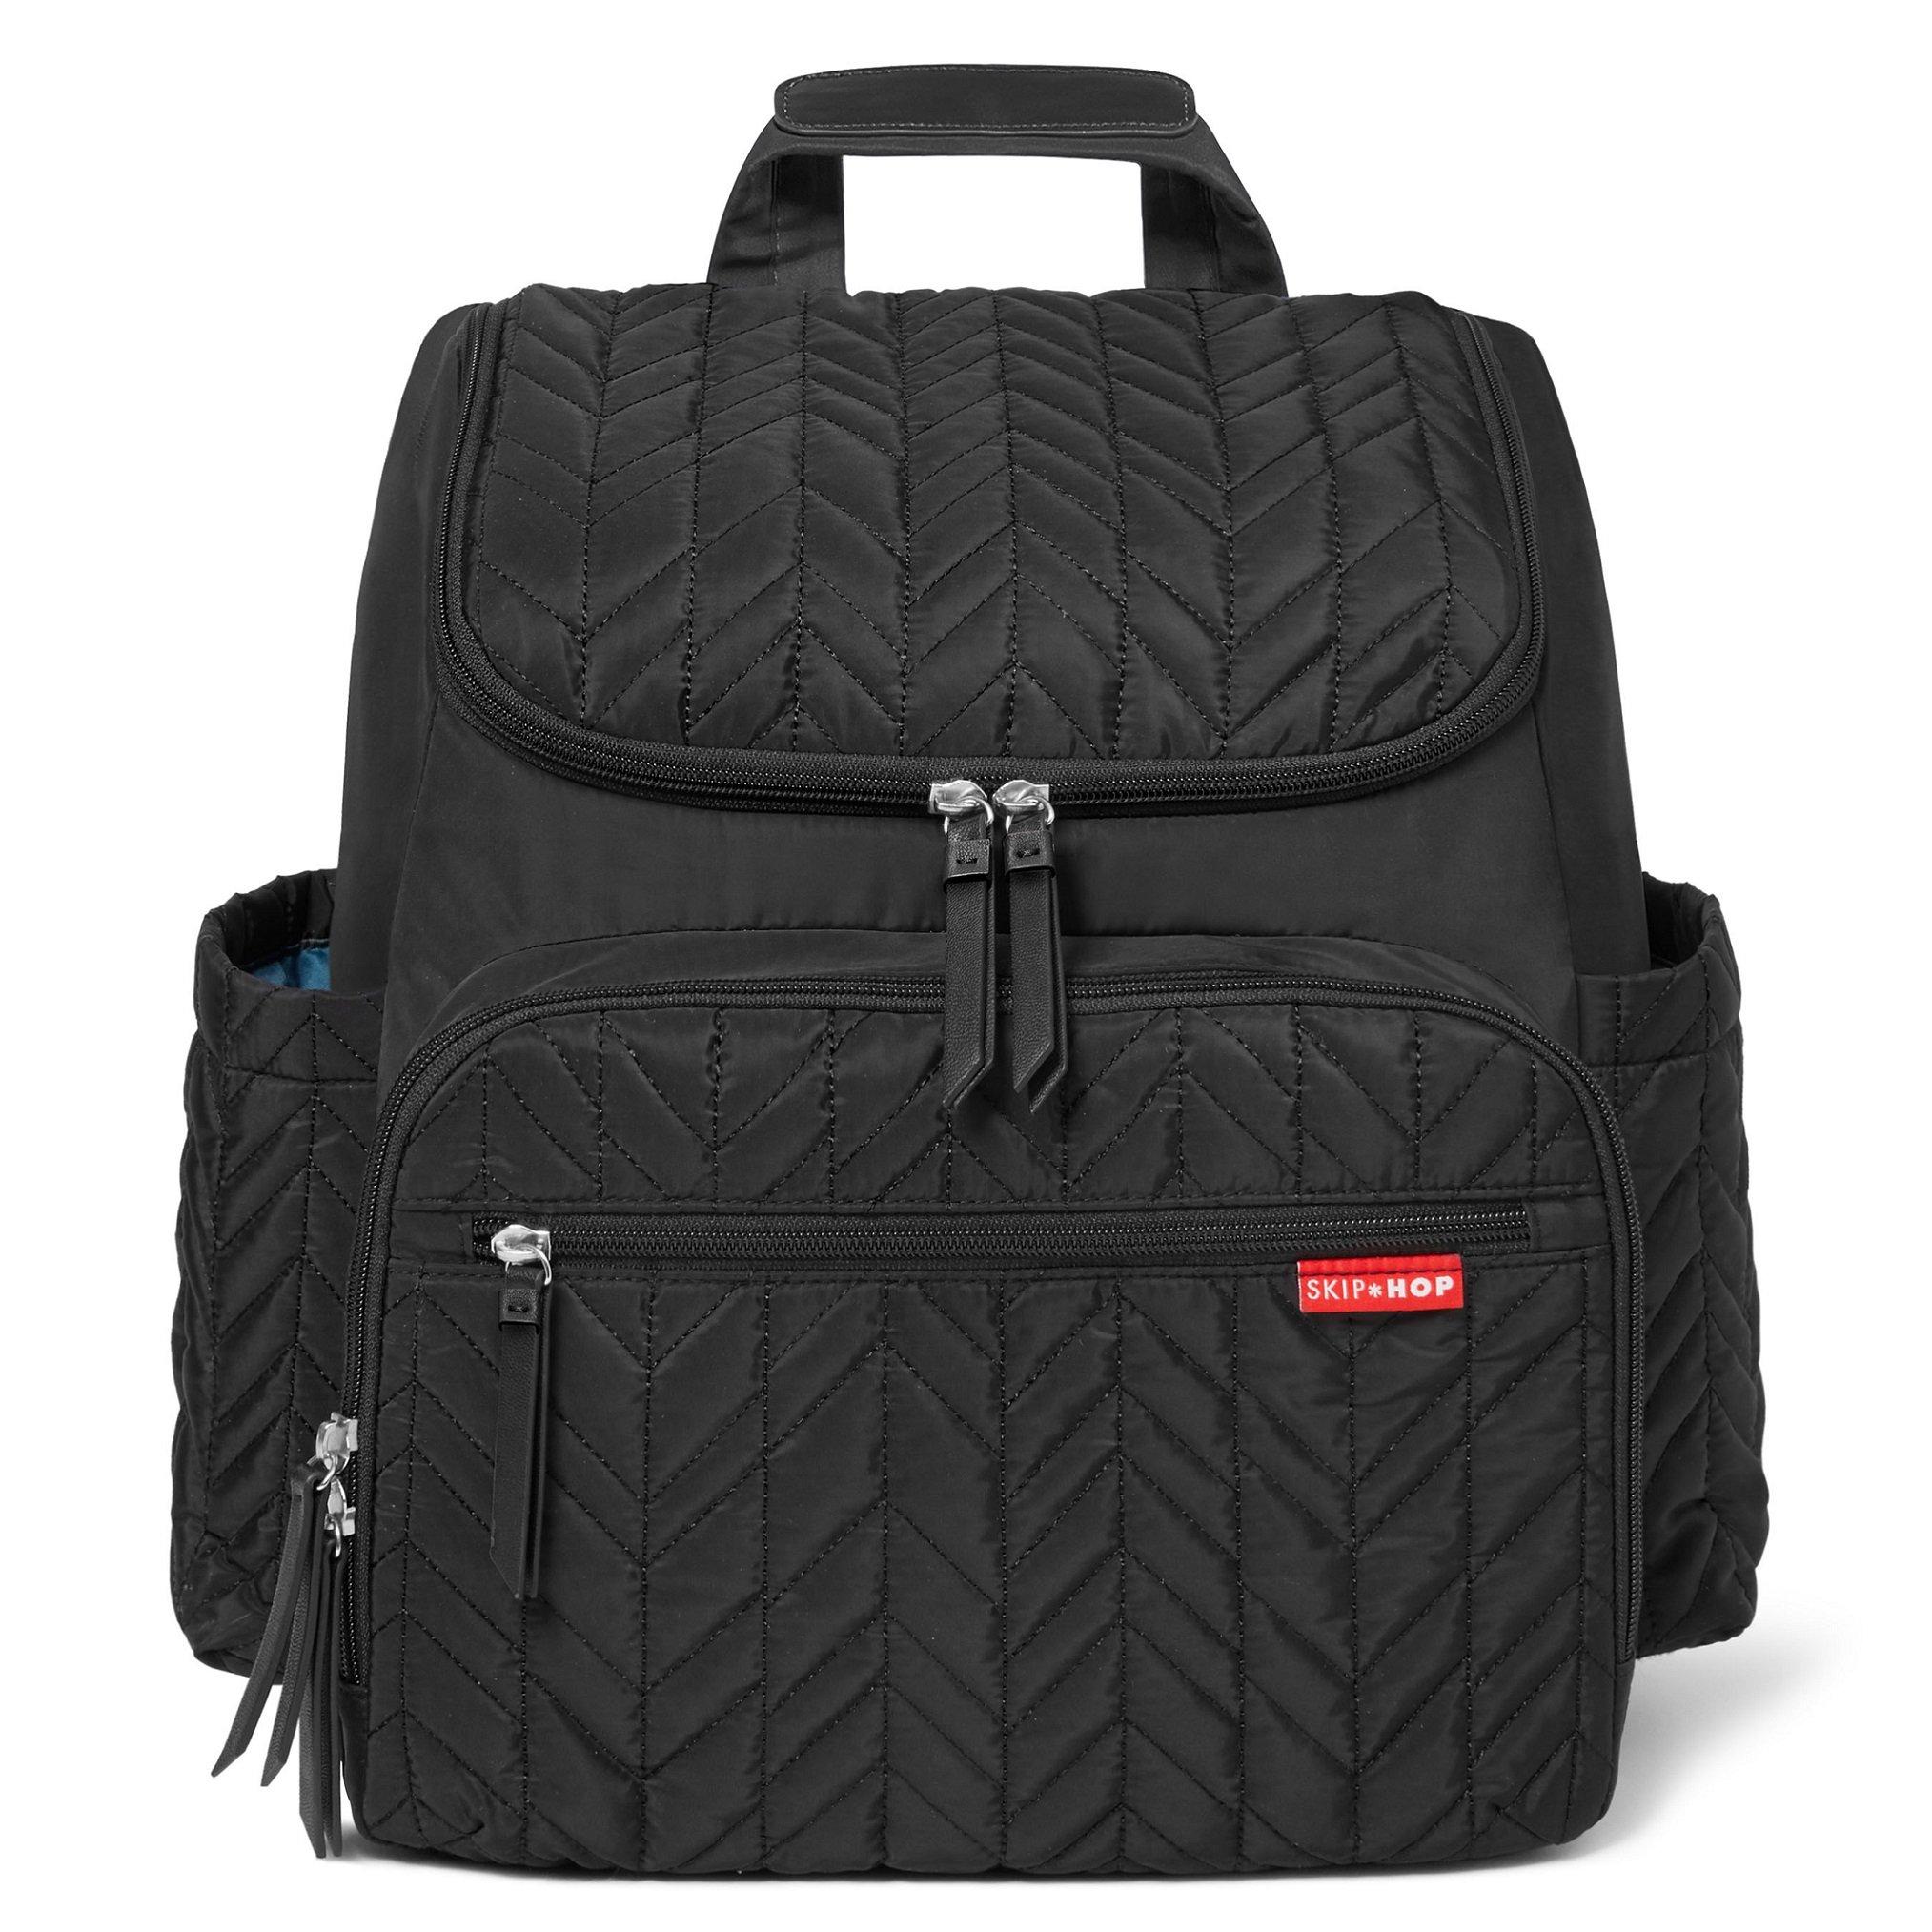 Skip Hop Backpack Multi Function Changing